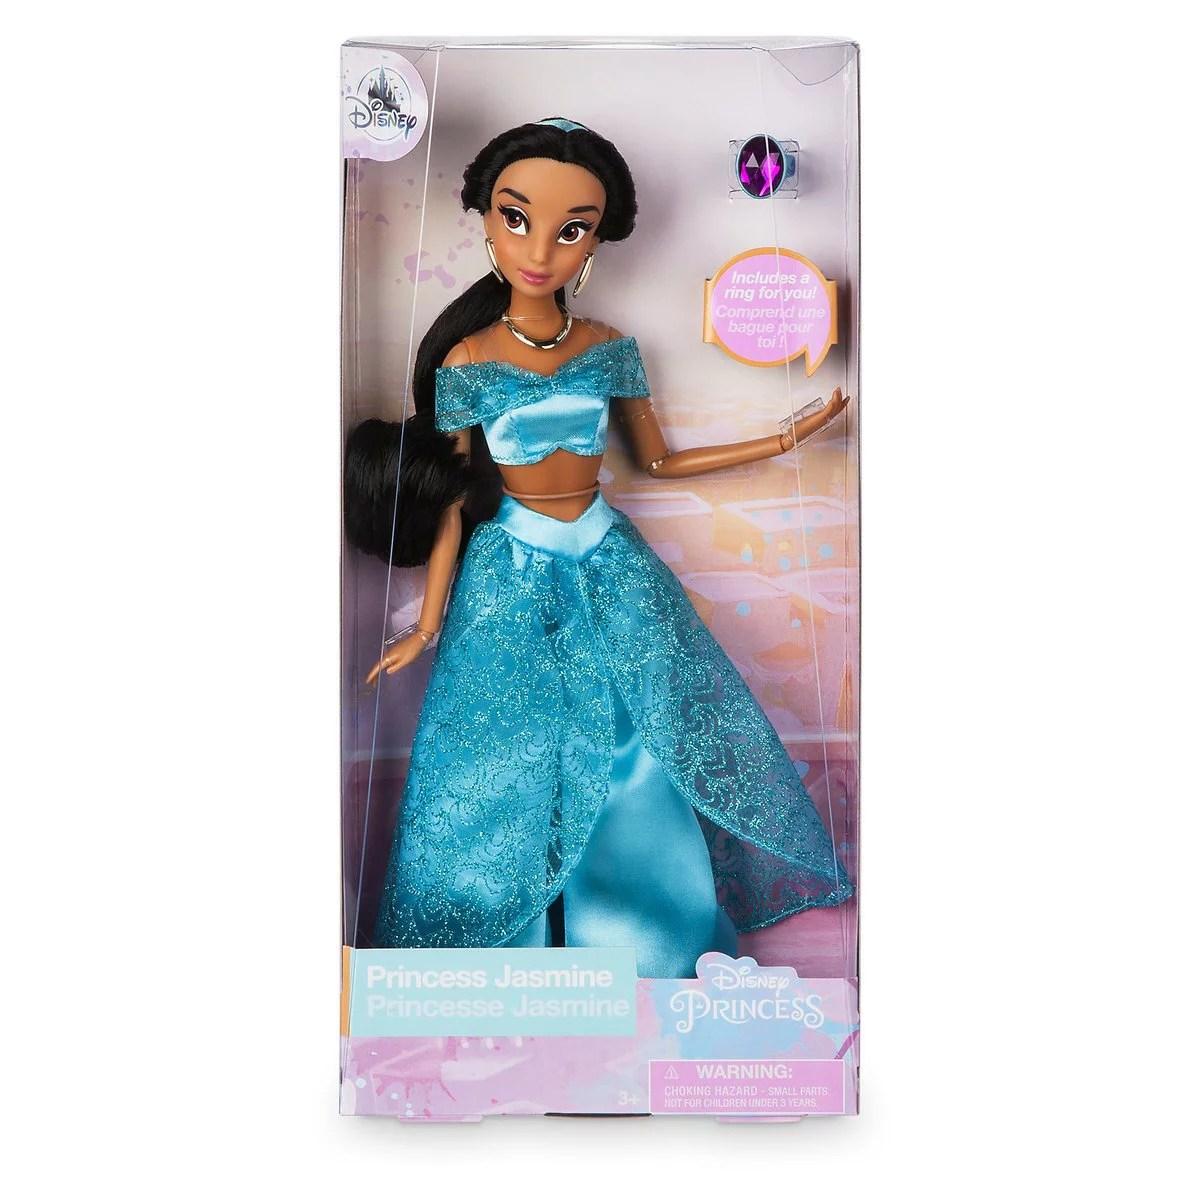 Disney Princess Jasmine Classic Doll With Ring New With Box Walmart Com Walmart Com